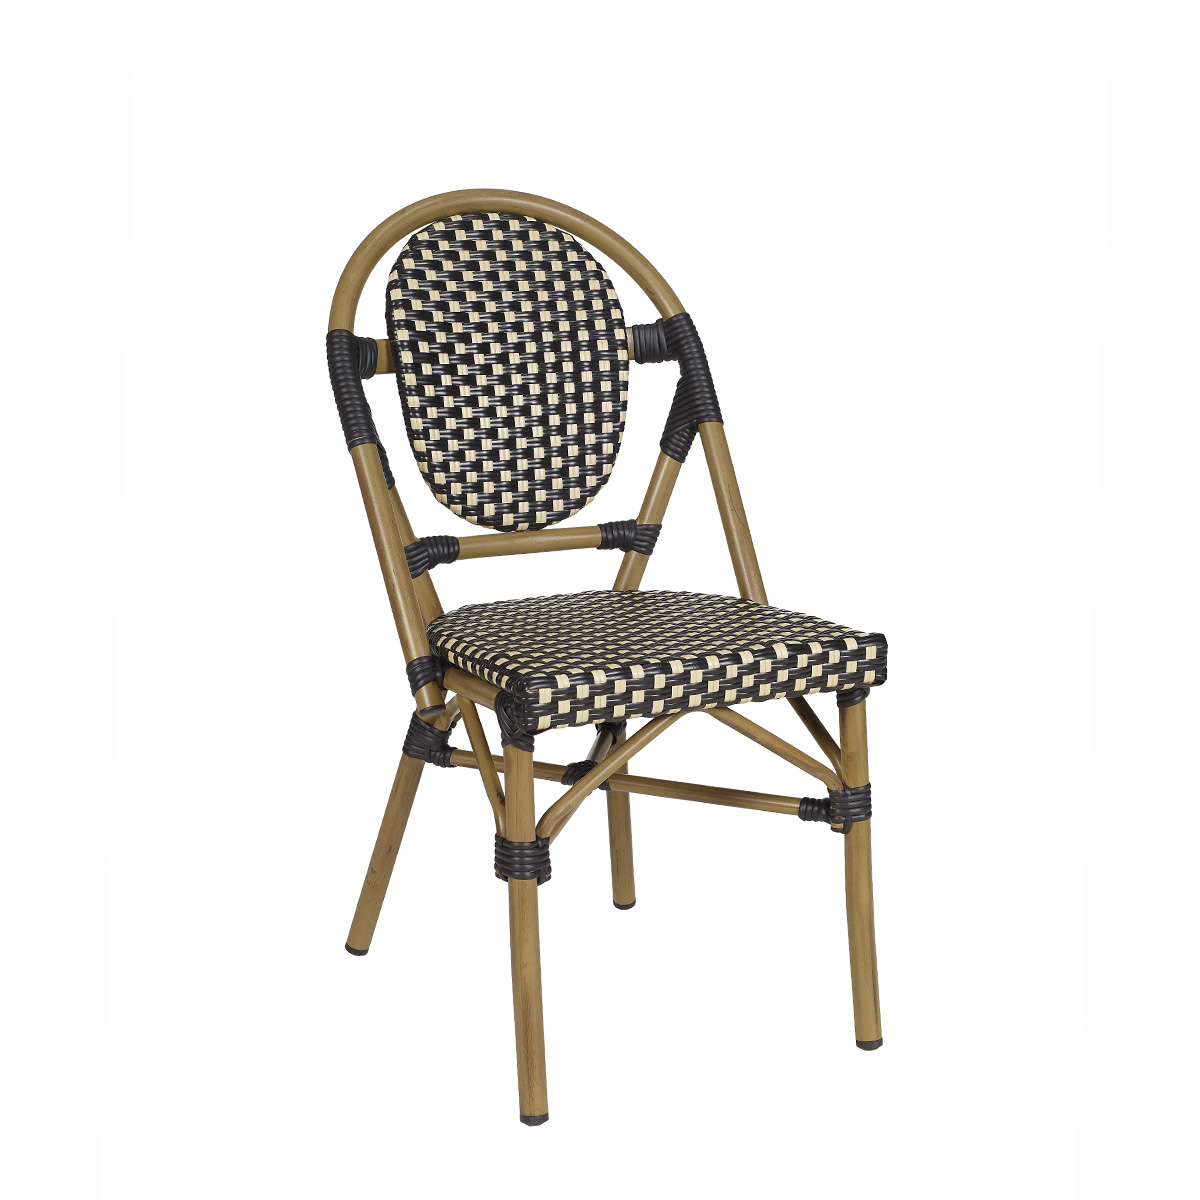 silla charlotte deco bambu medula negro y crema